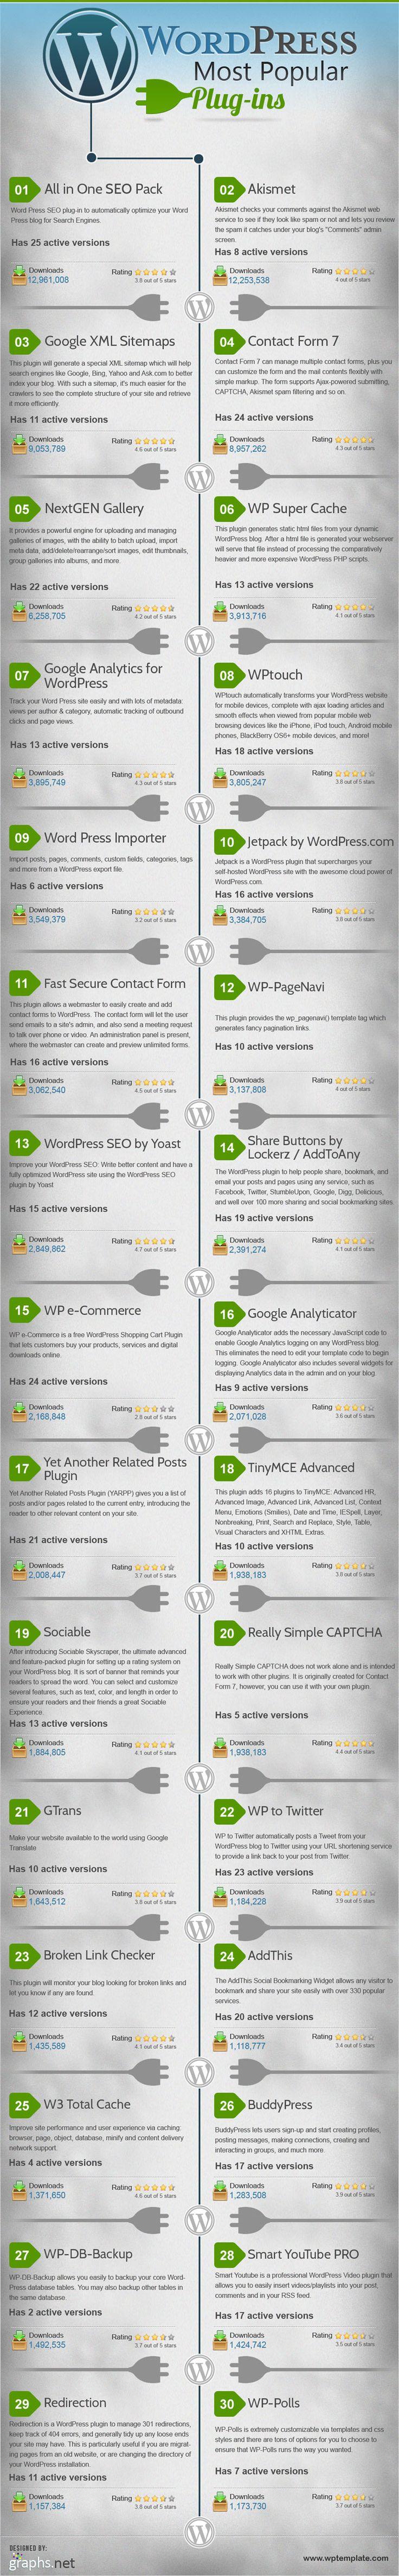 30 Most Popular WordPress Plugins - infographic